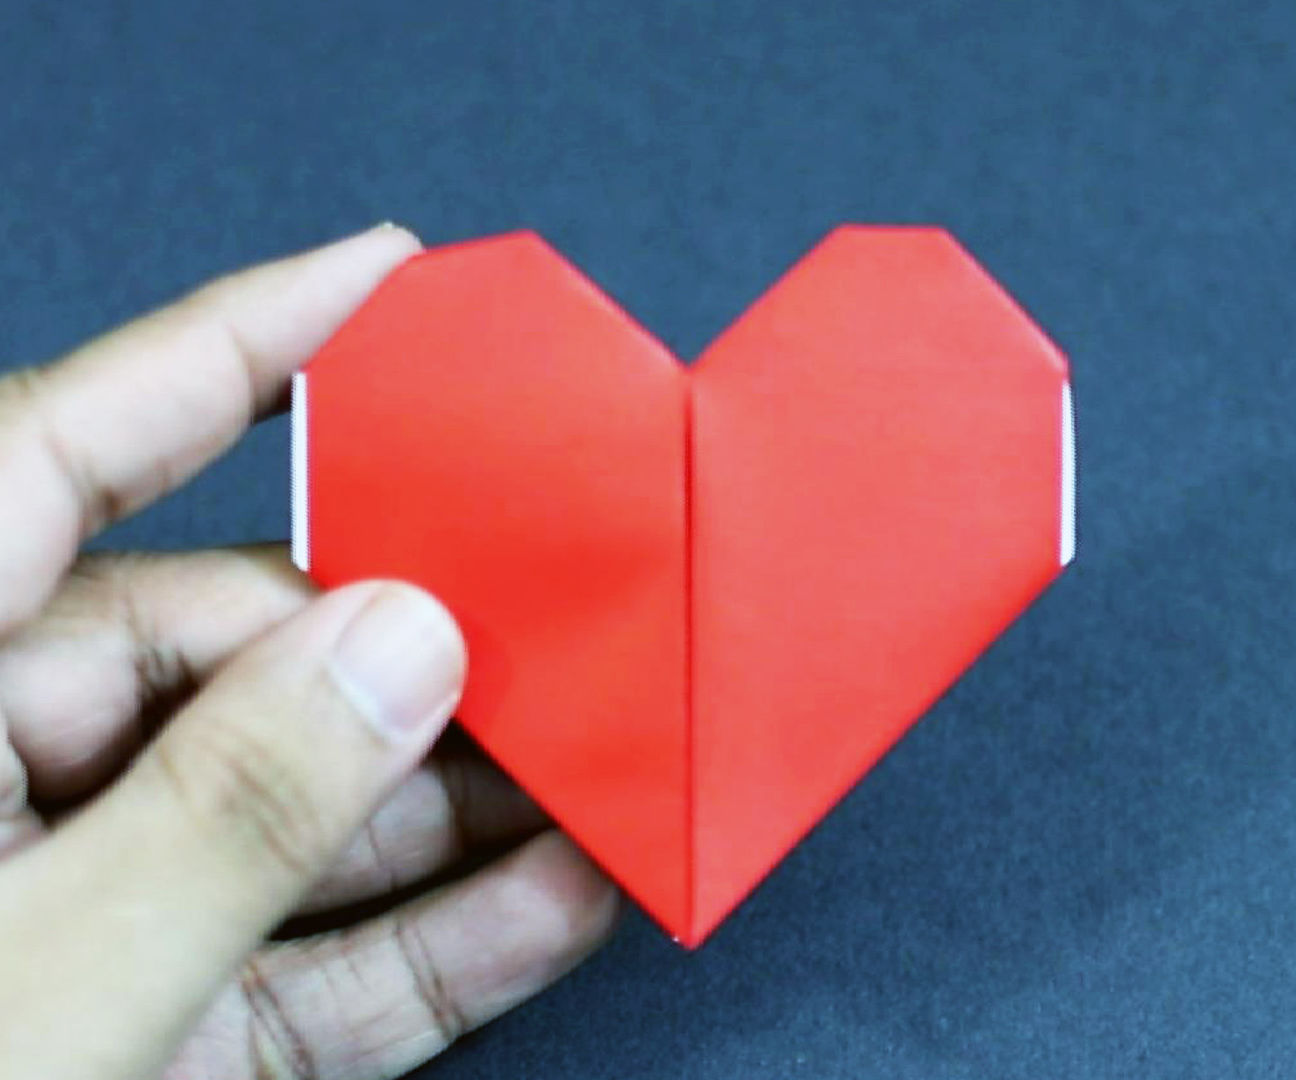 Easy Origami Heart Valentine's Day Gift Idea!